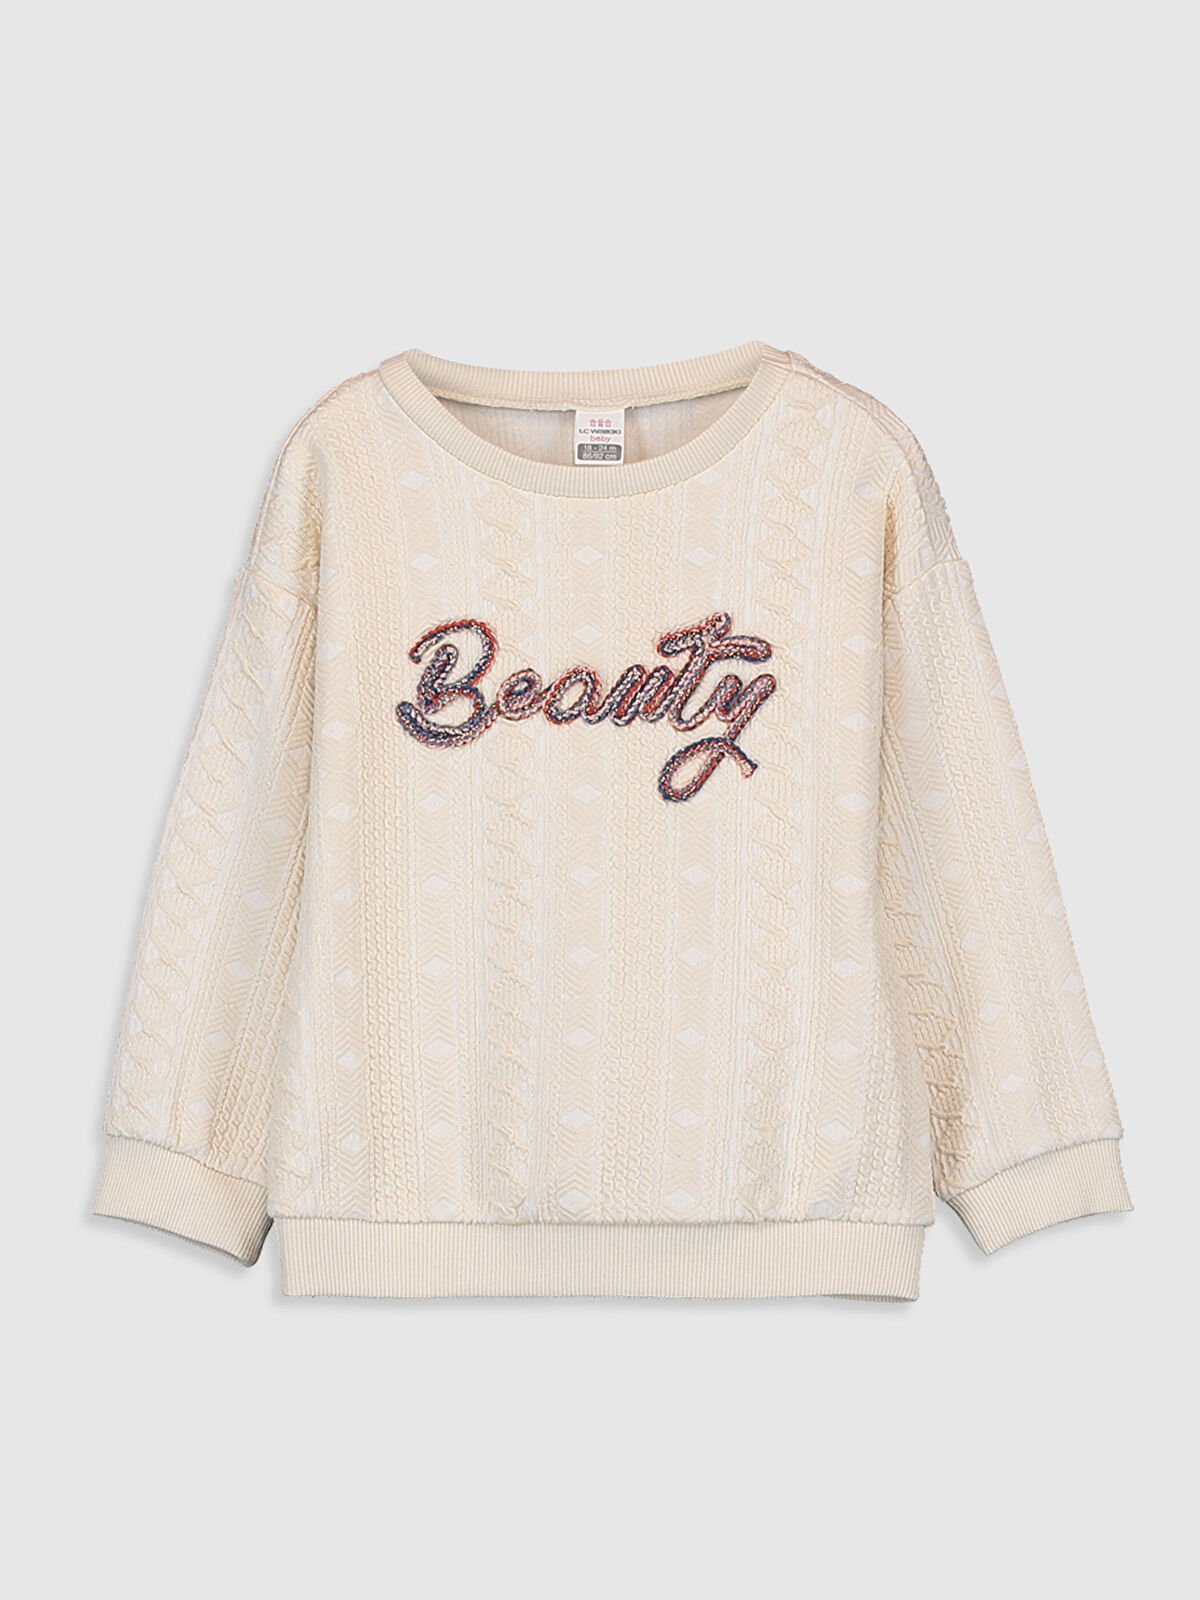 Kız Bebek Jakarlı Sweatshirt - LC WAIKIKI